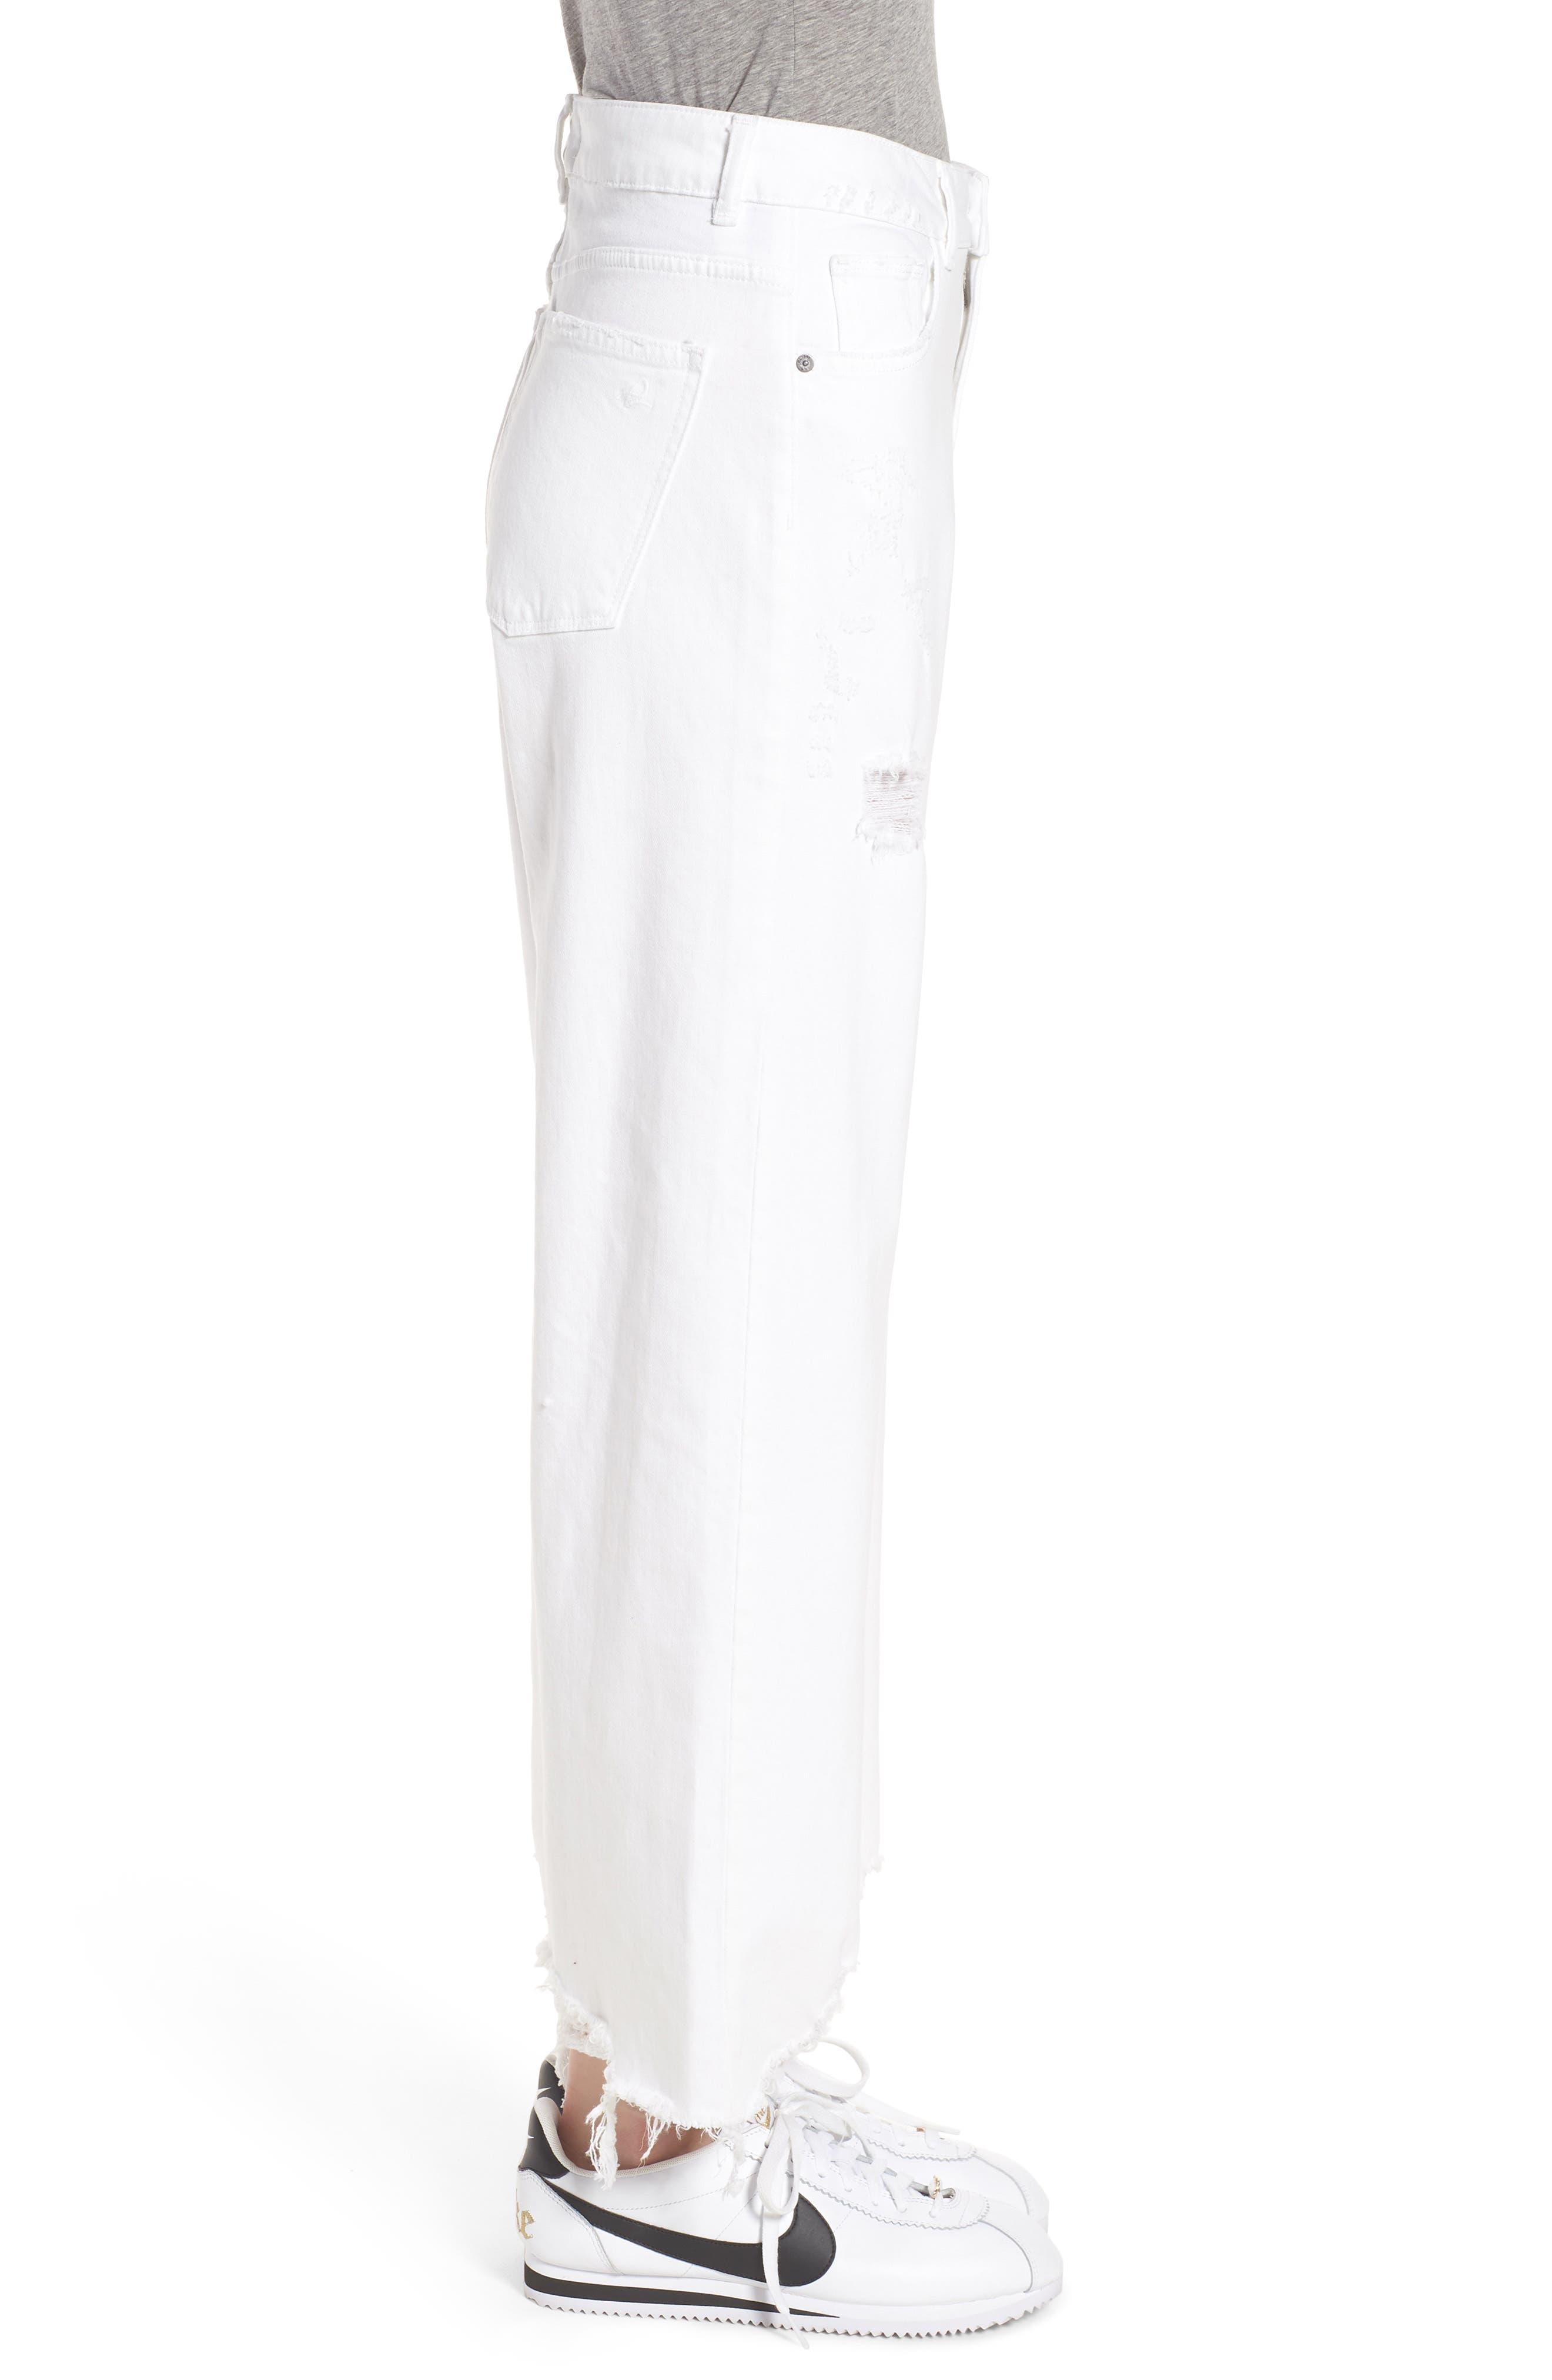 Hepburn High Waist Wide Leg Jeans,                             Alternate thumbnail 3, color,                             100